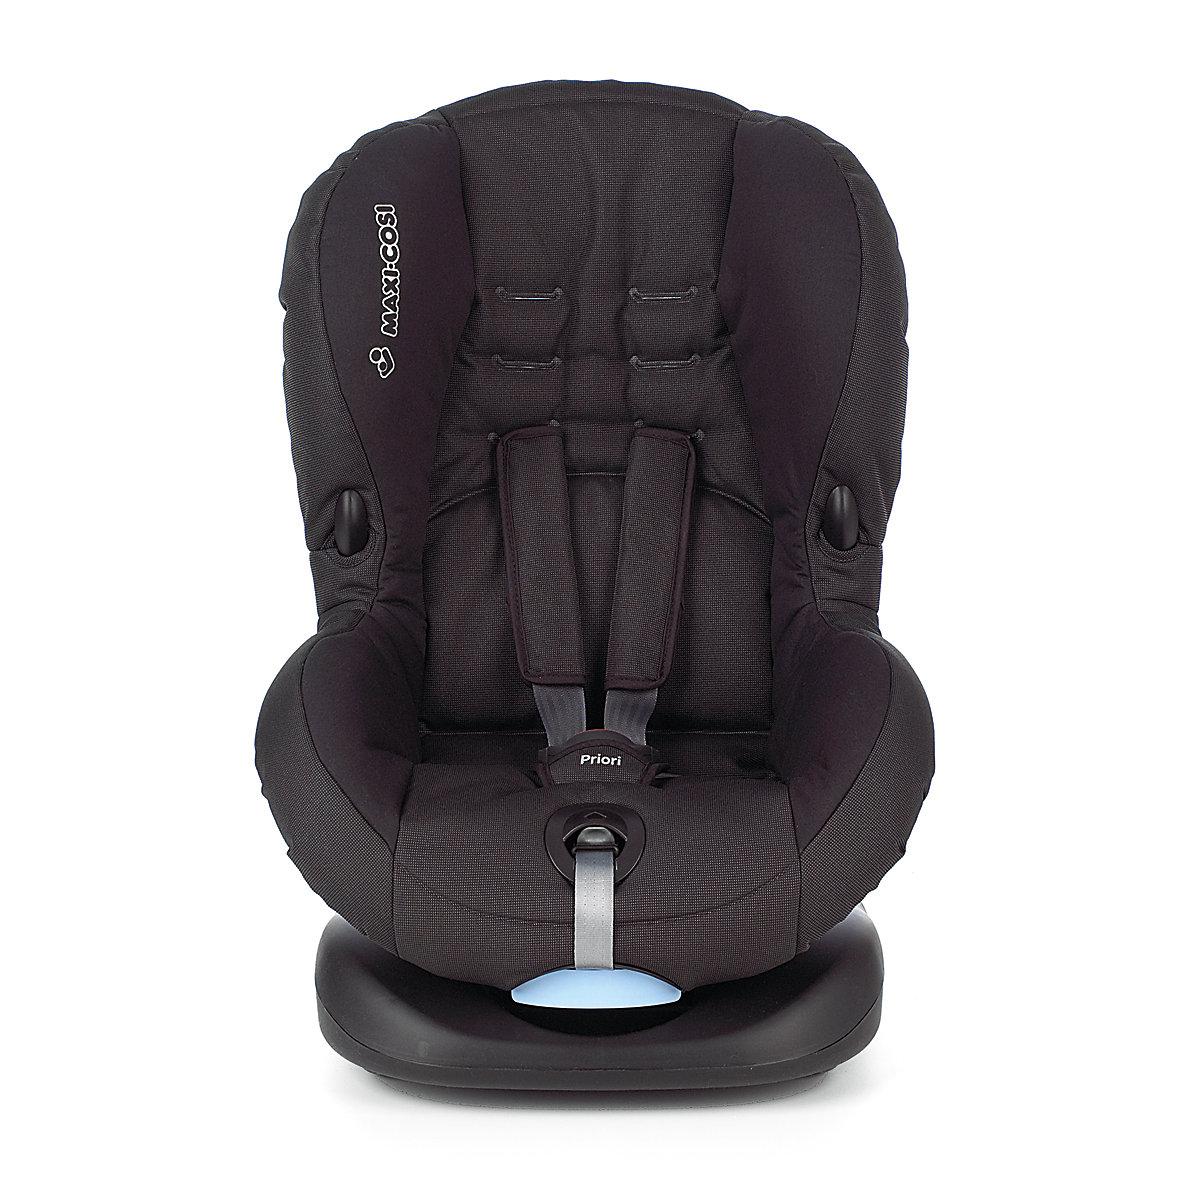 maxi cosi priori sps child car seat compare prices at foundem. Black Bedroom Furniture Sets. Home Design Ideas